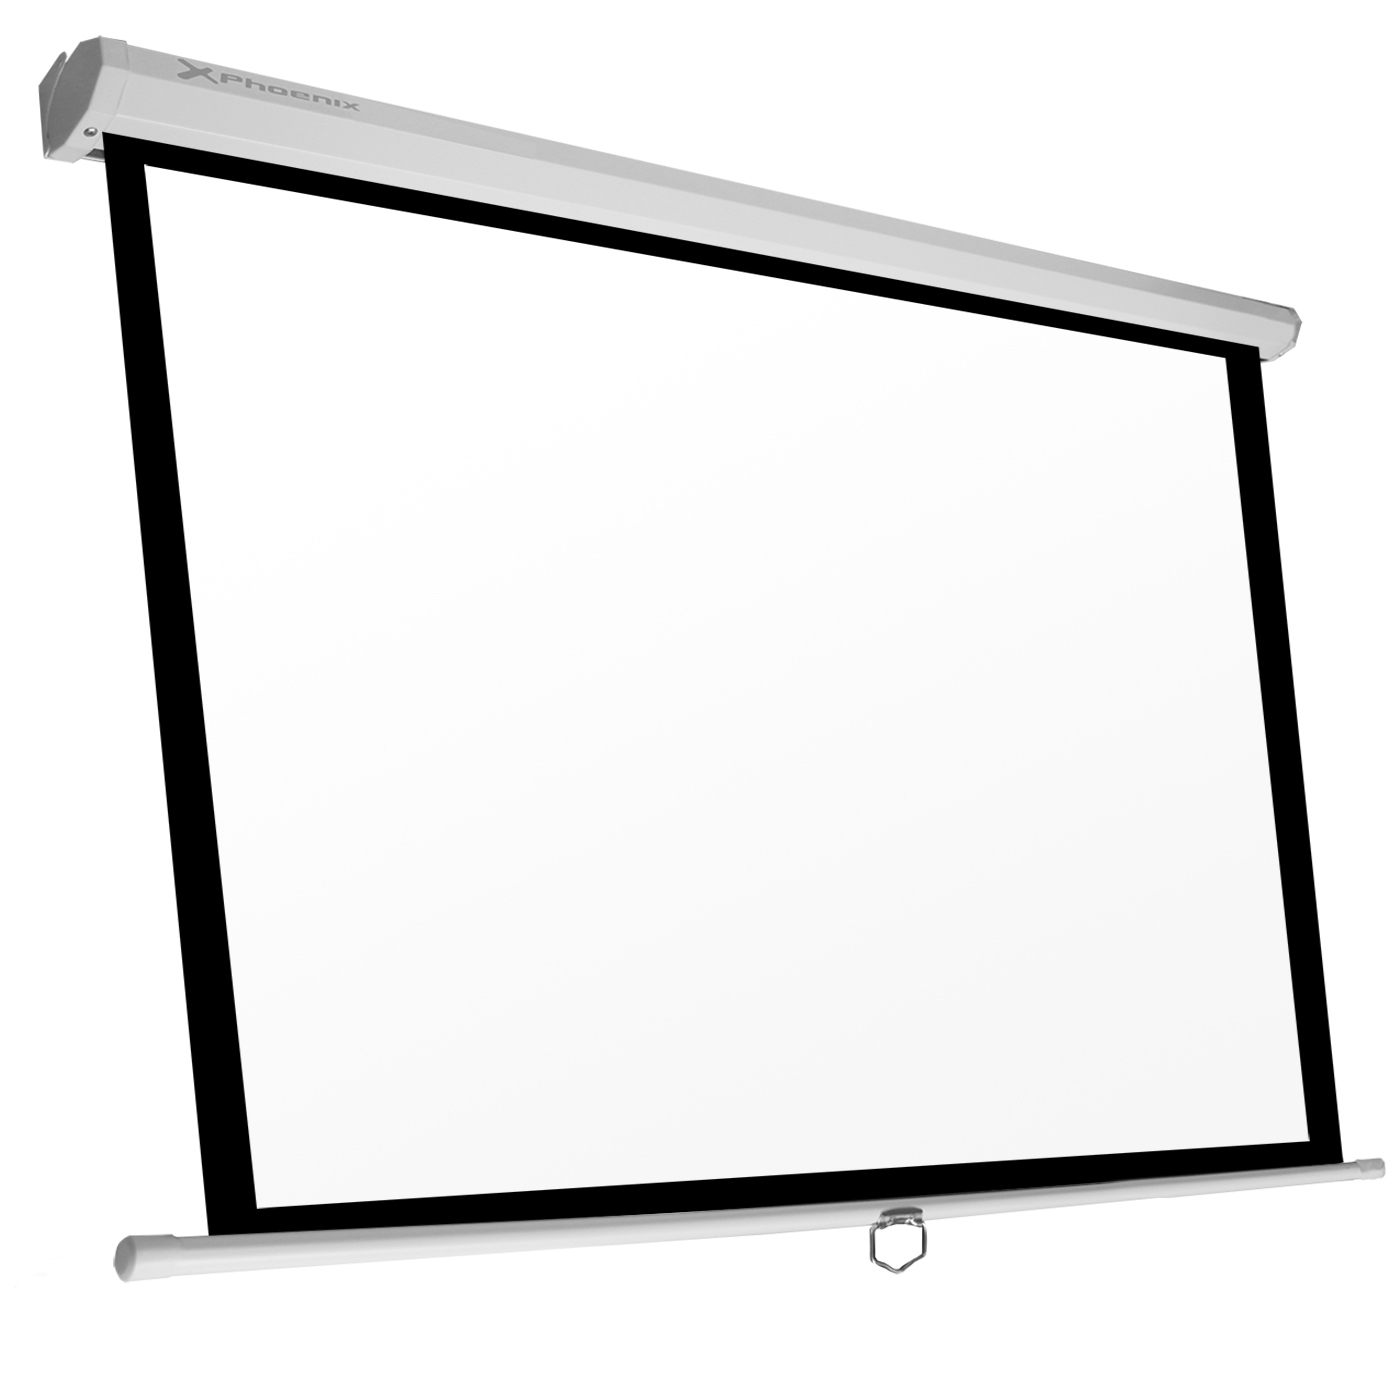 Pantalla Manual Videoproyector Phoenix 135?? 2.4m X 2.4m PHPANTALLA-240